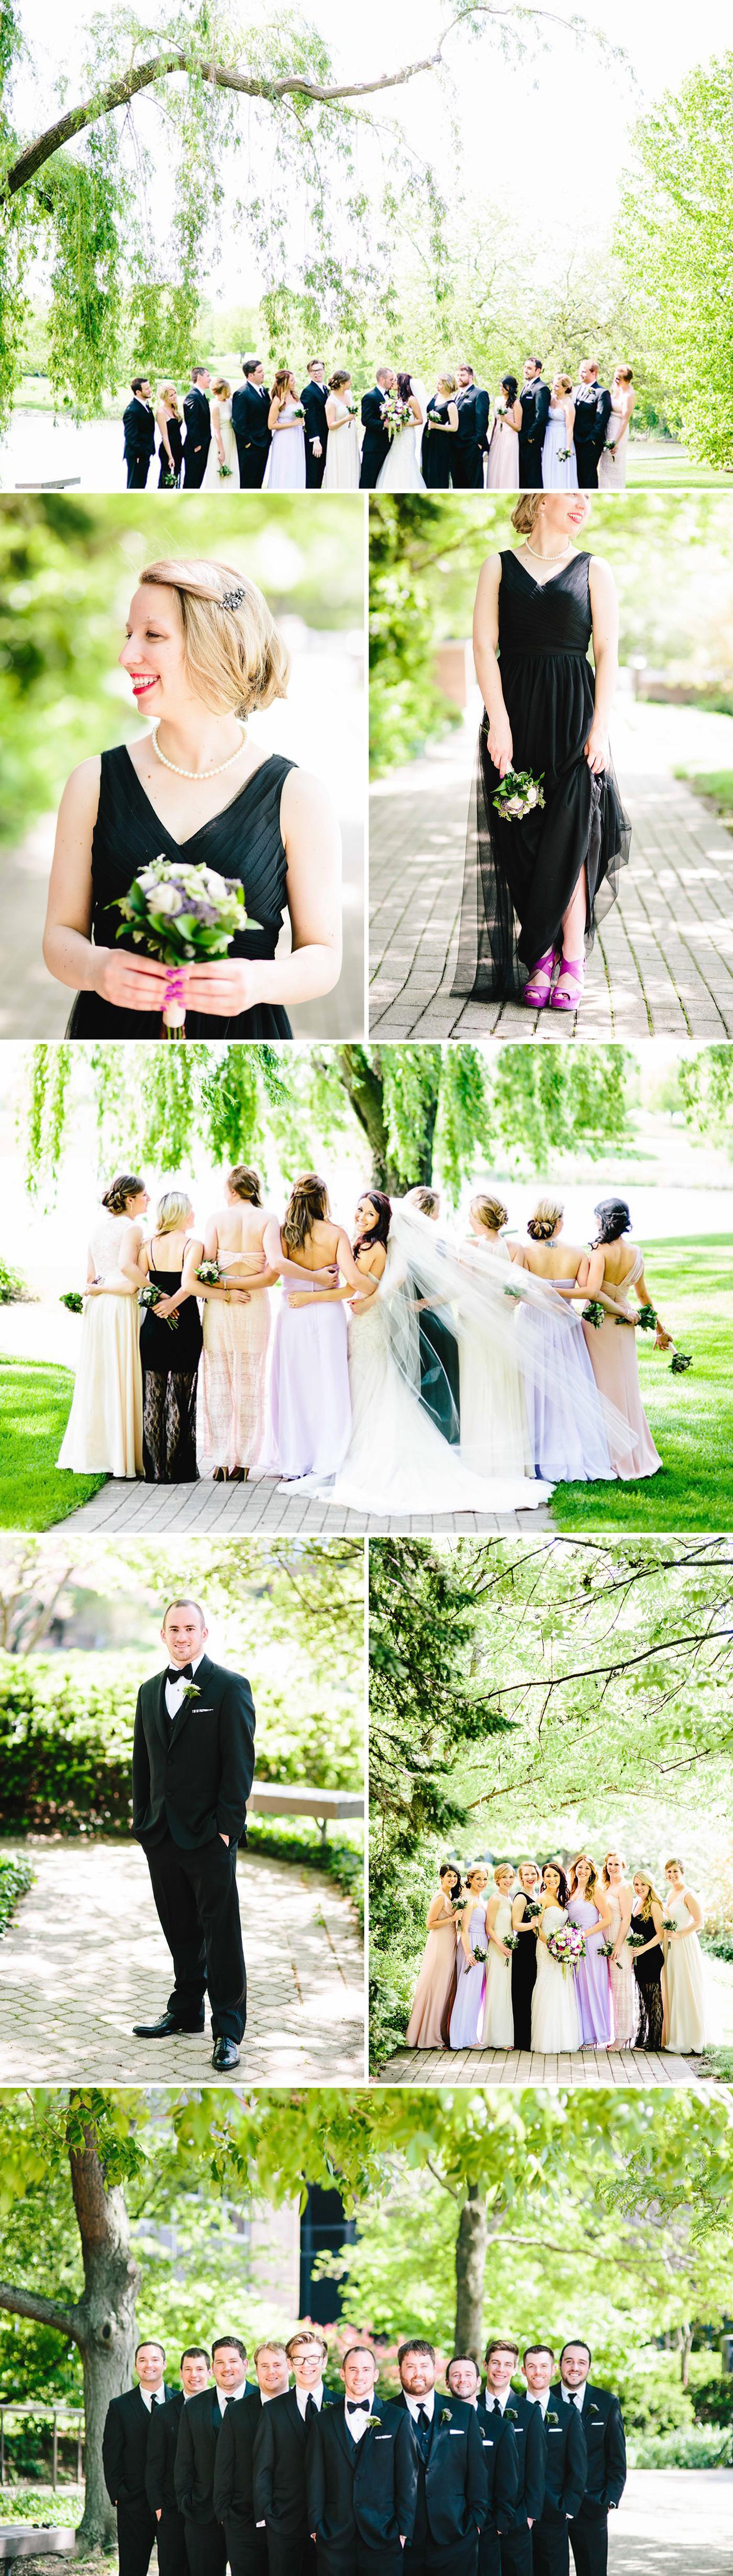 chicago-fine-art-wedding-photography-alger4